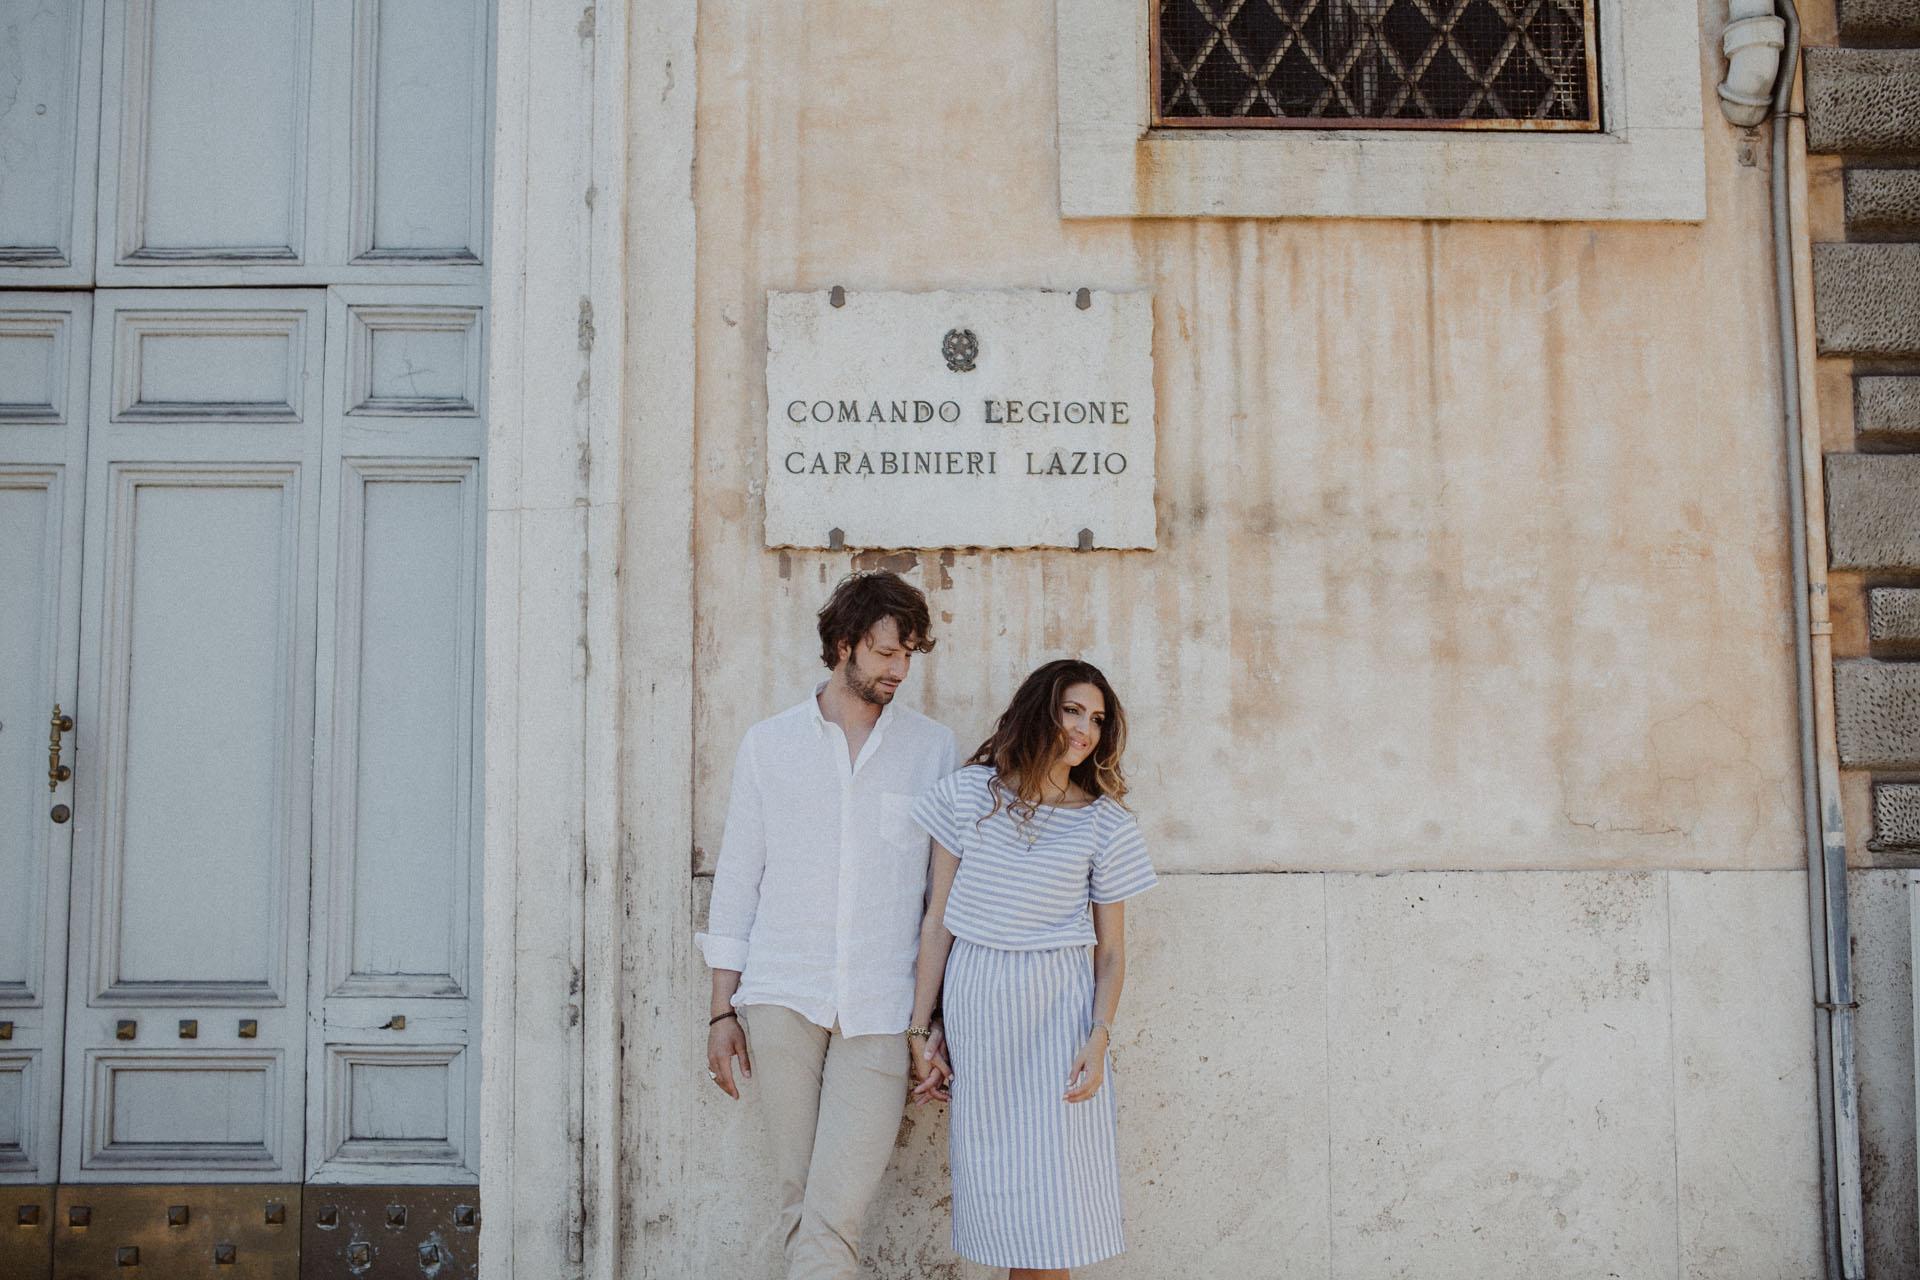 coupleshooting-roma-hochzeitsfotografen-wien-agnesundandi-9